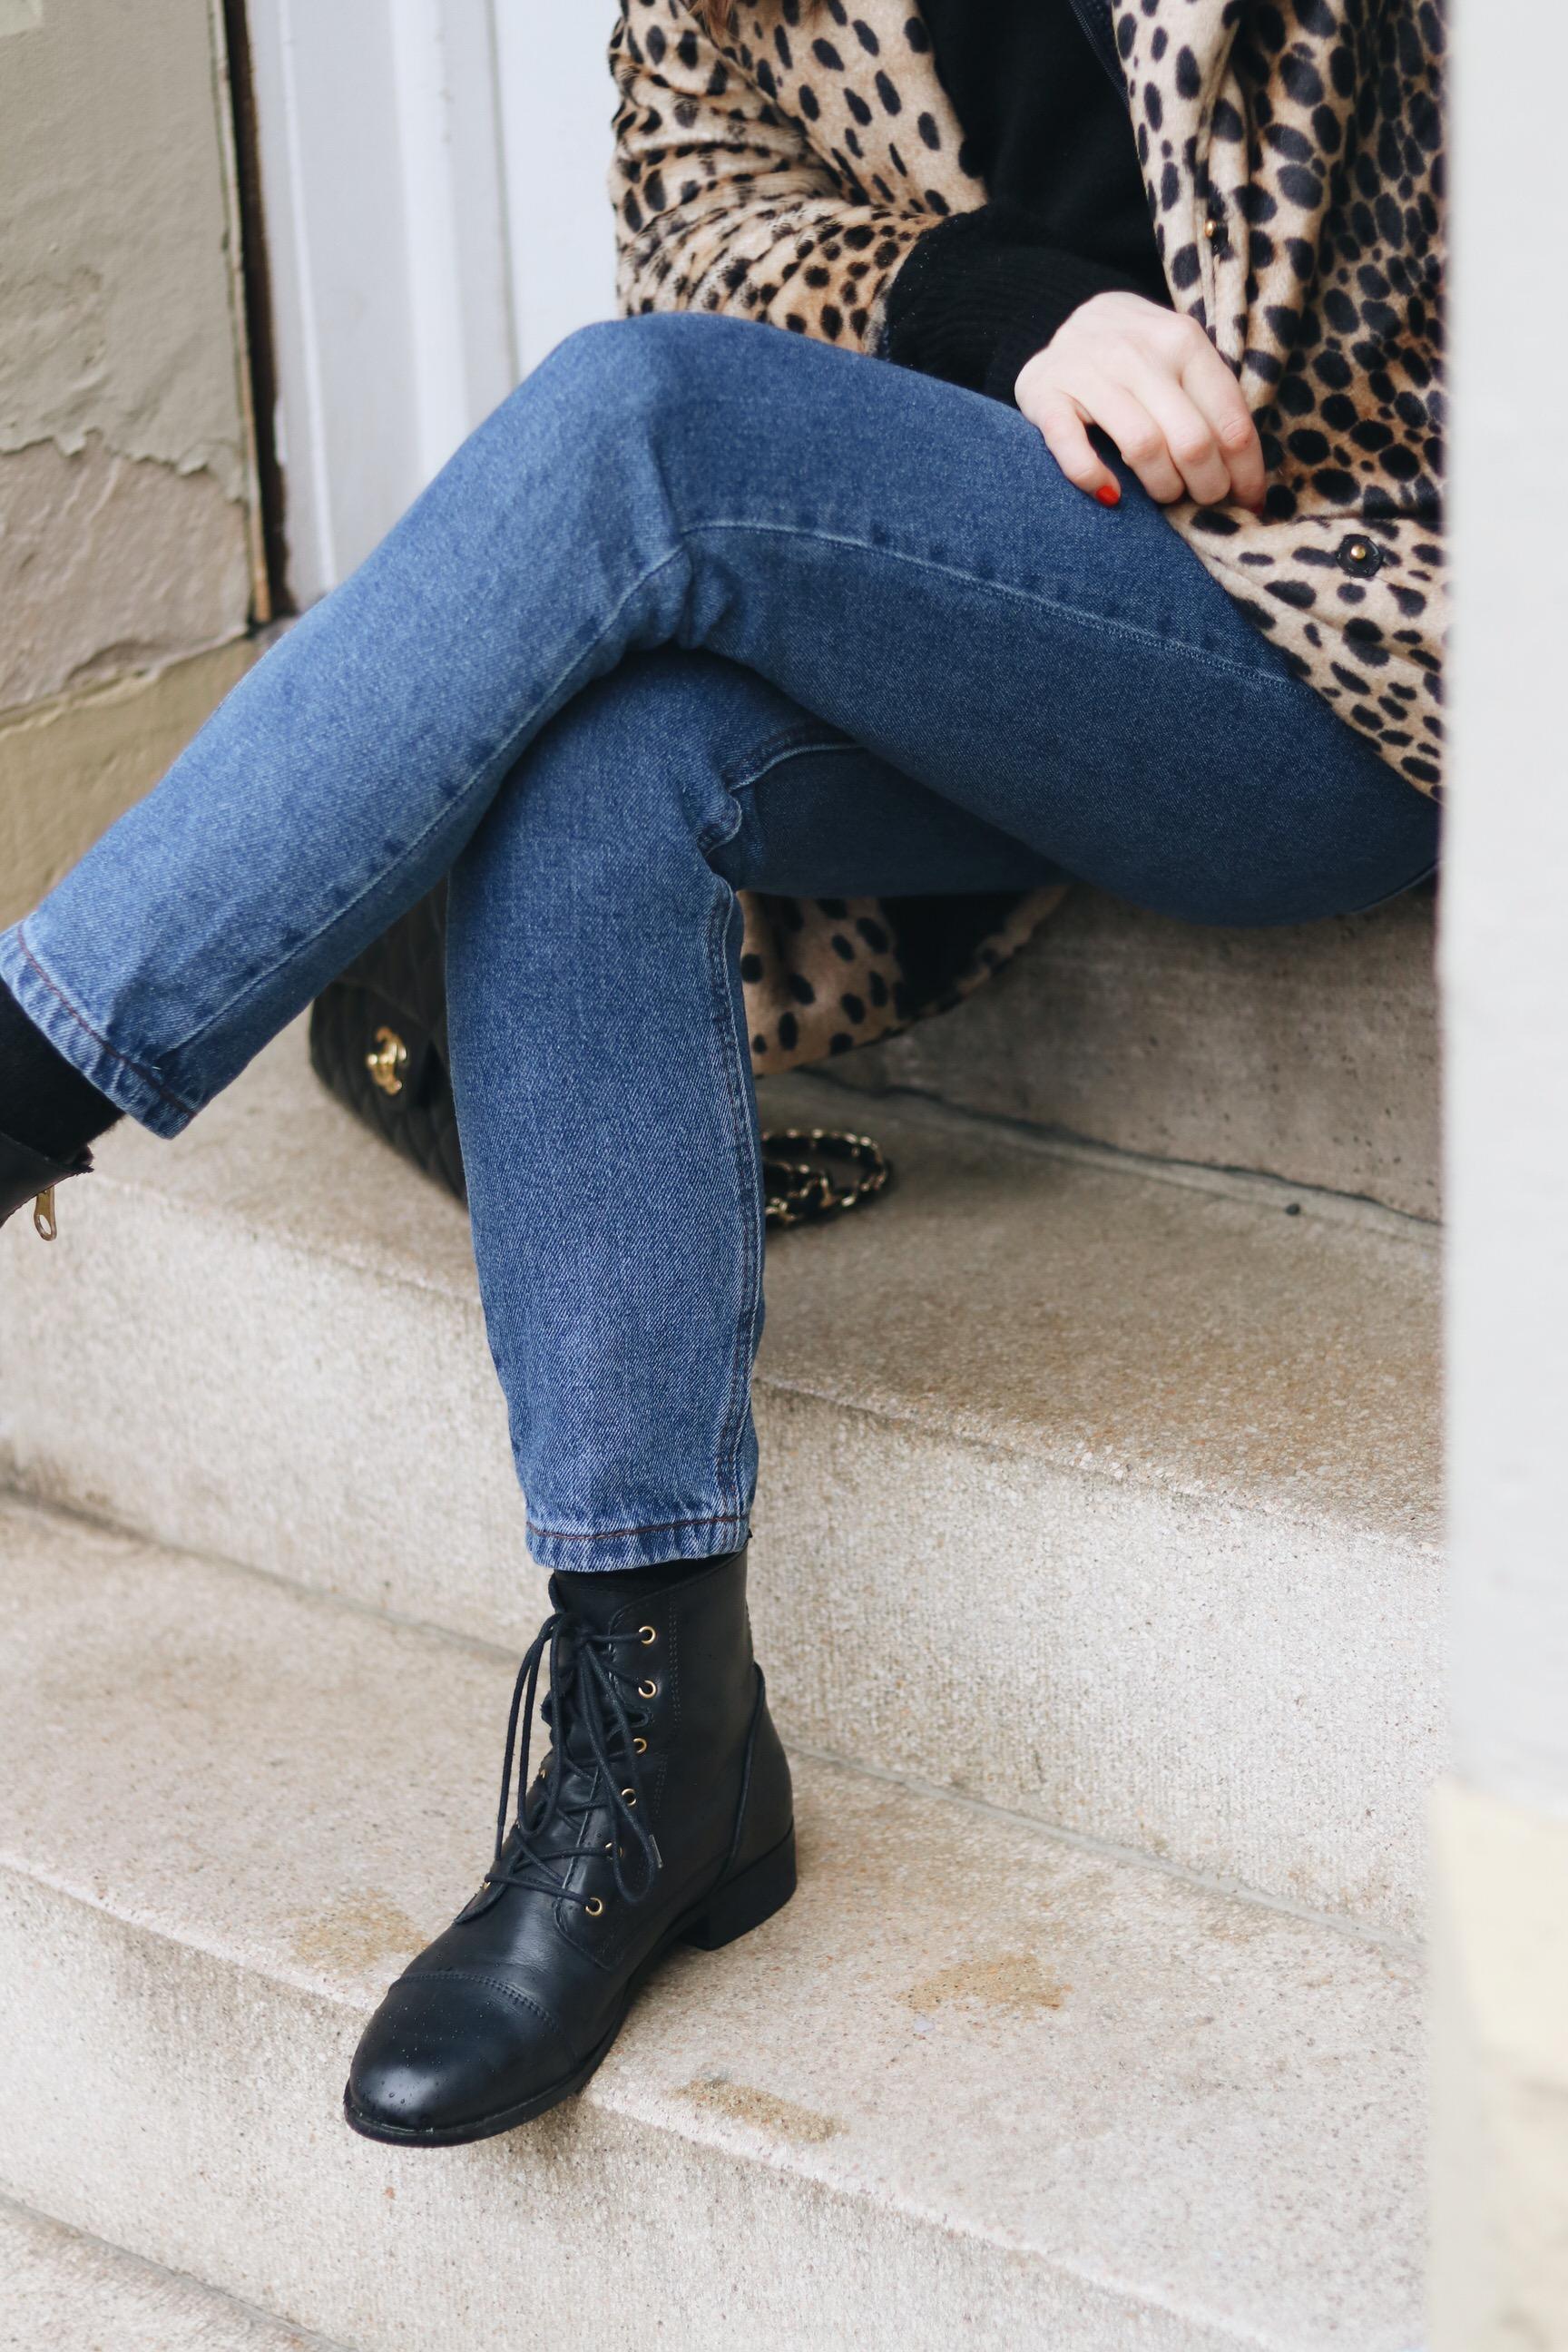 High Waist Jeans kaufen kombinieren Outfit Ideen Streetstyle Modeblog Look